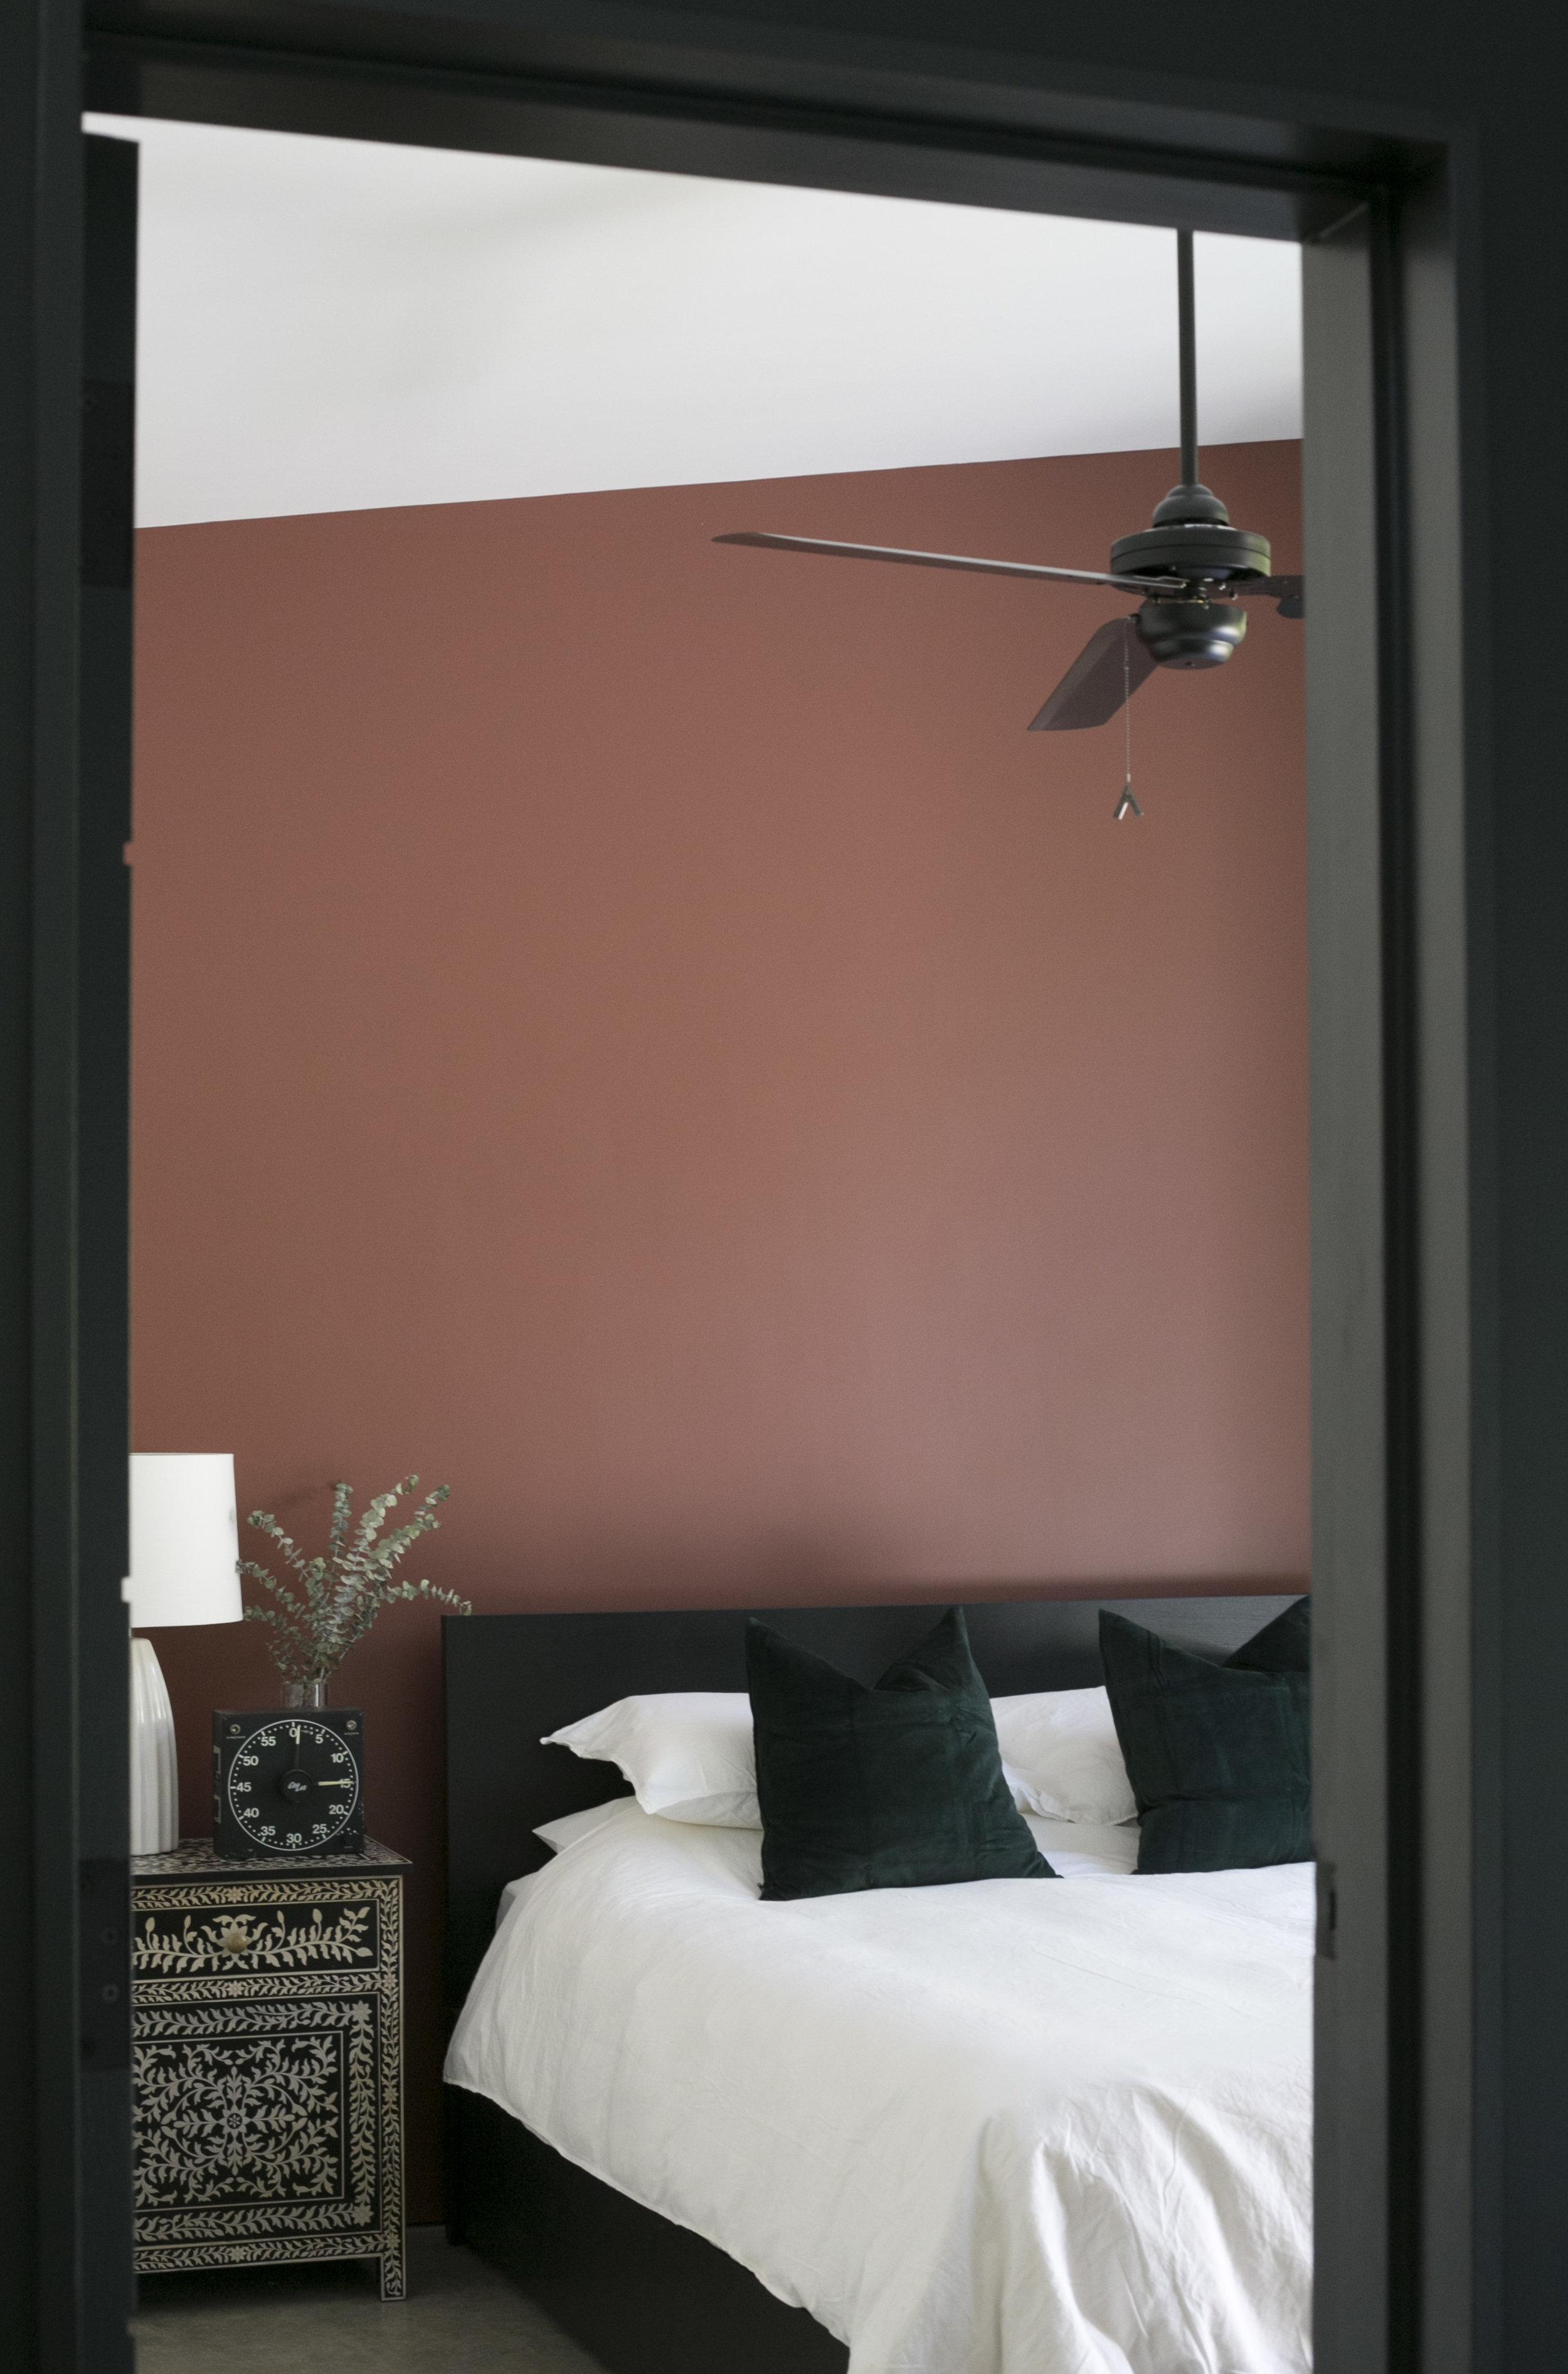 switch-house-bedroom-accent-wall-ceiling-fan.jpg